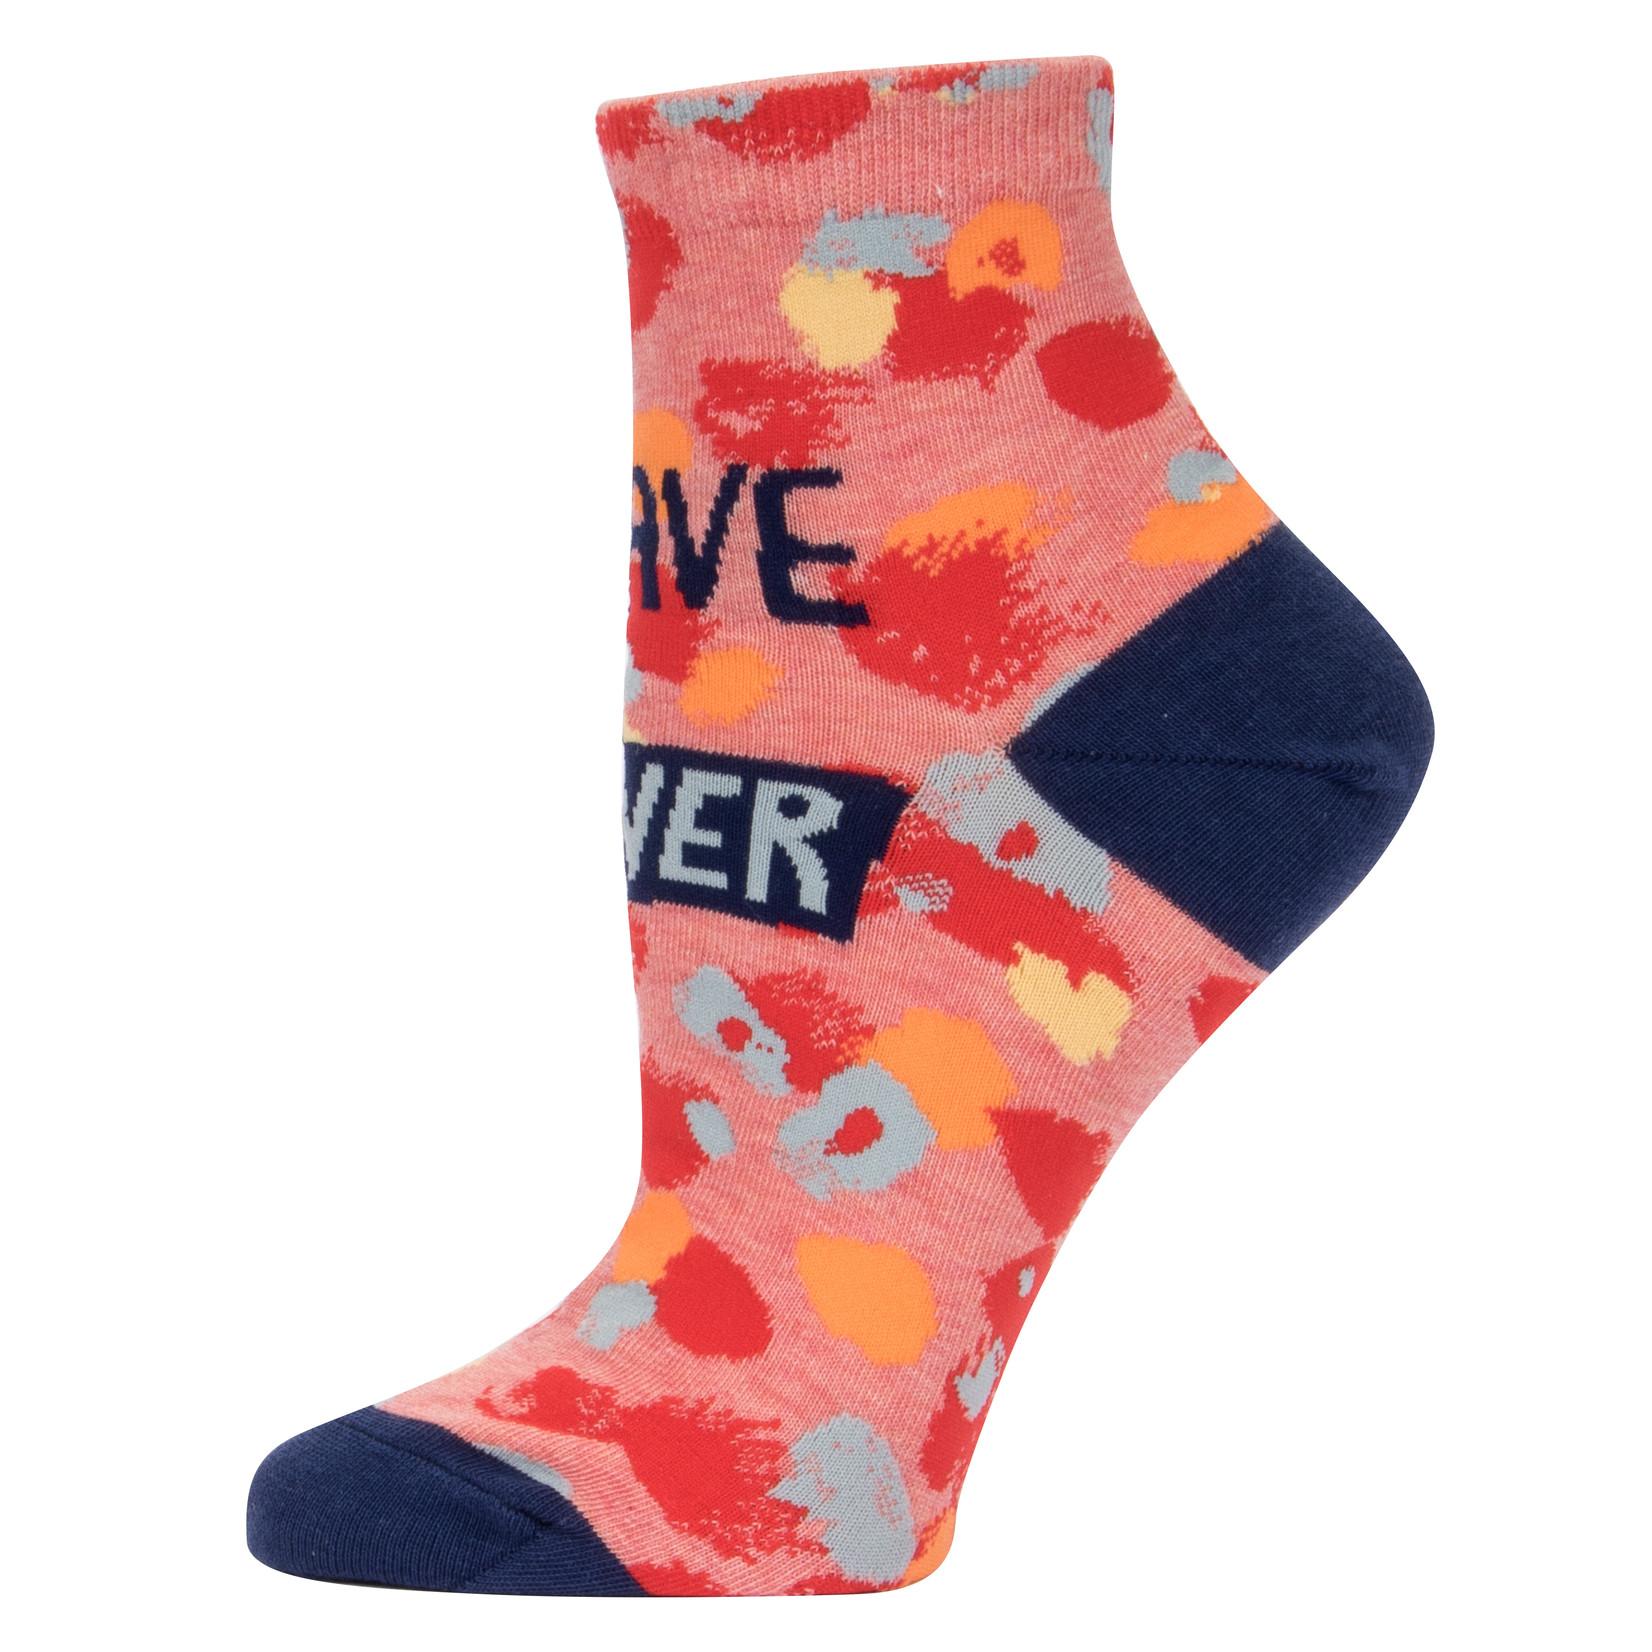 Blue Q I'll Behave Never W - Ankle Socks